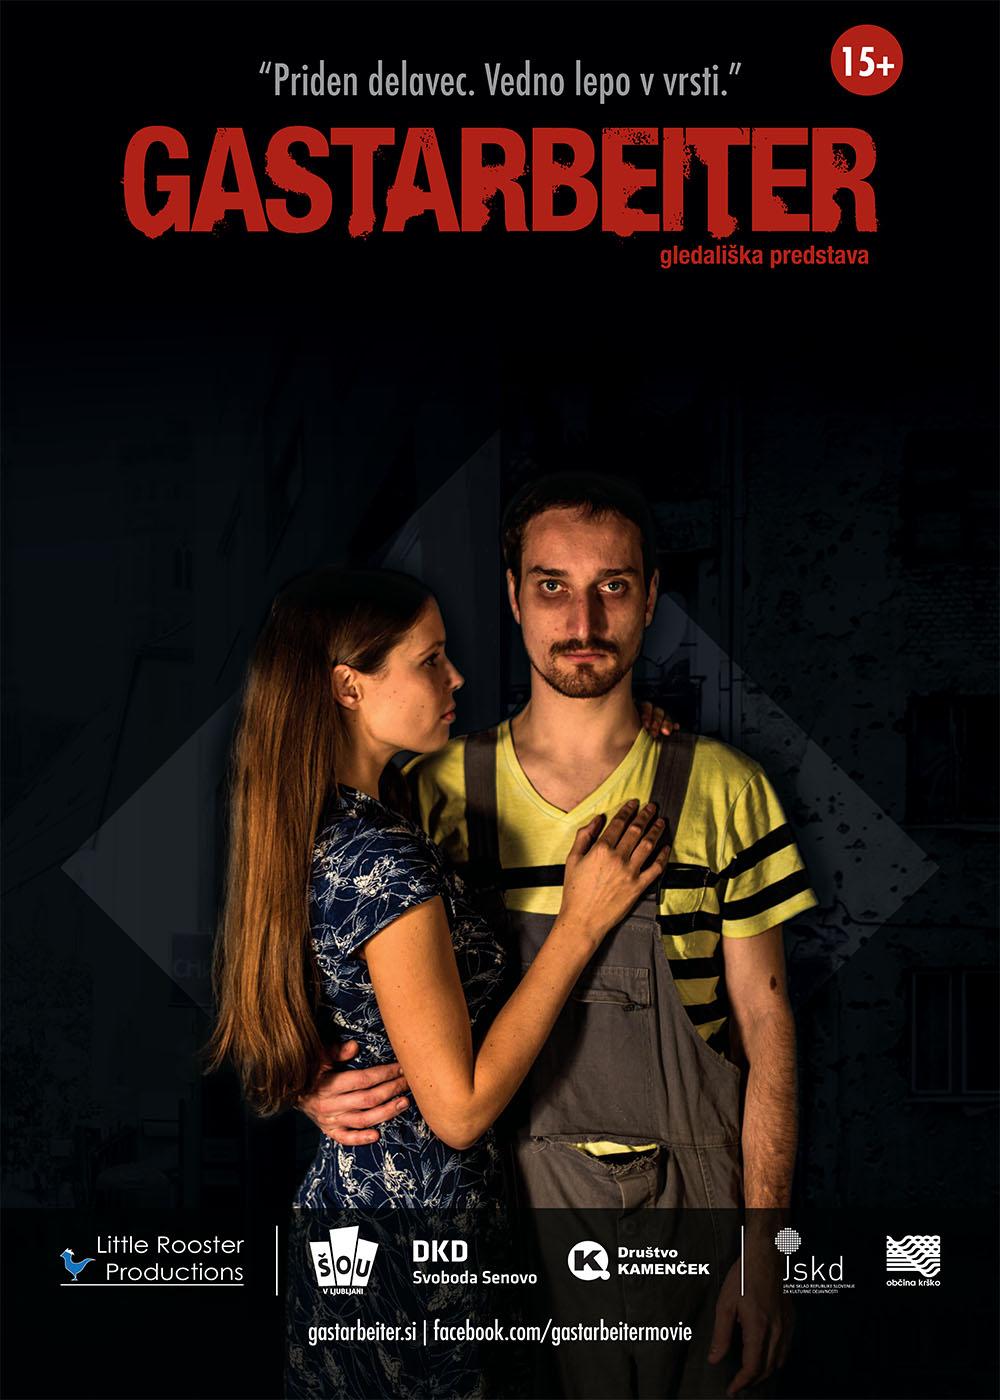 Gastarbeiter gledališka plakat